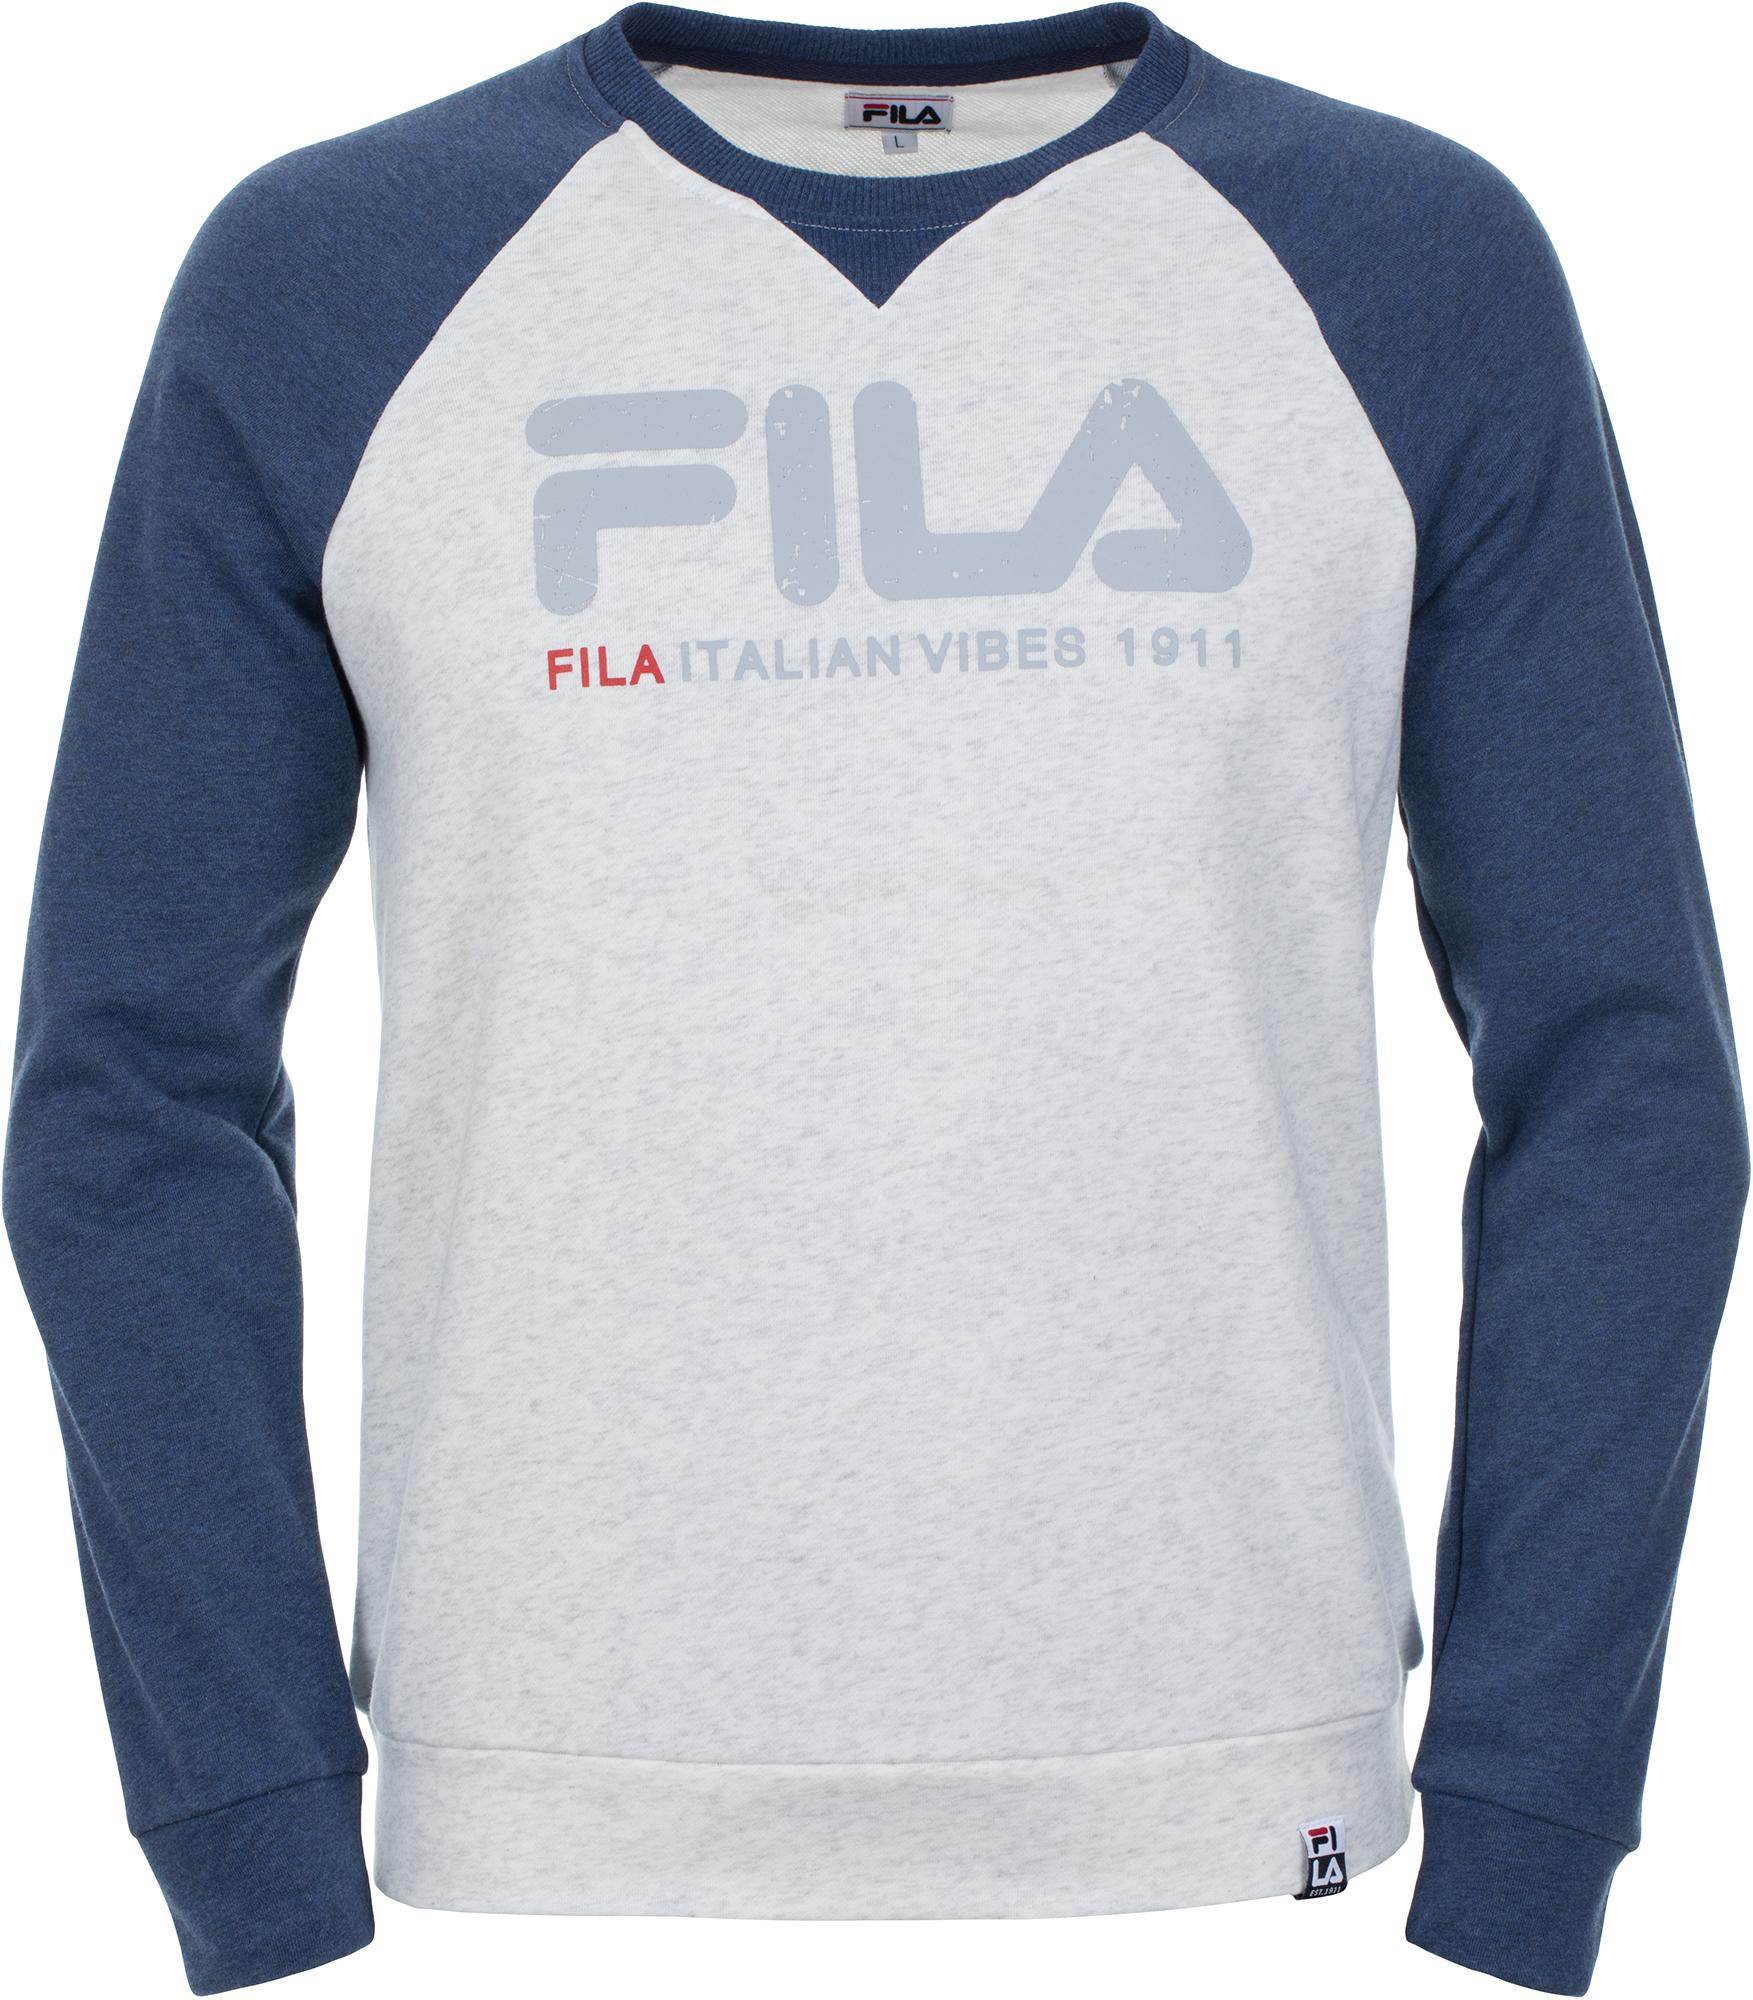 Fila Джемпер мужской Fila, размер 48